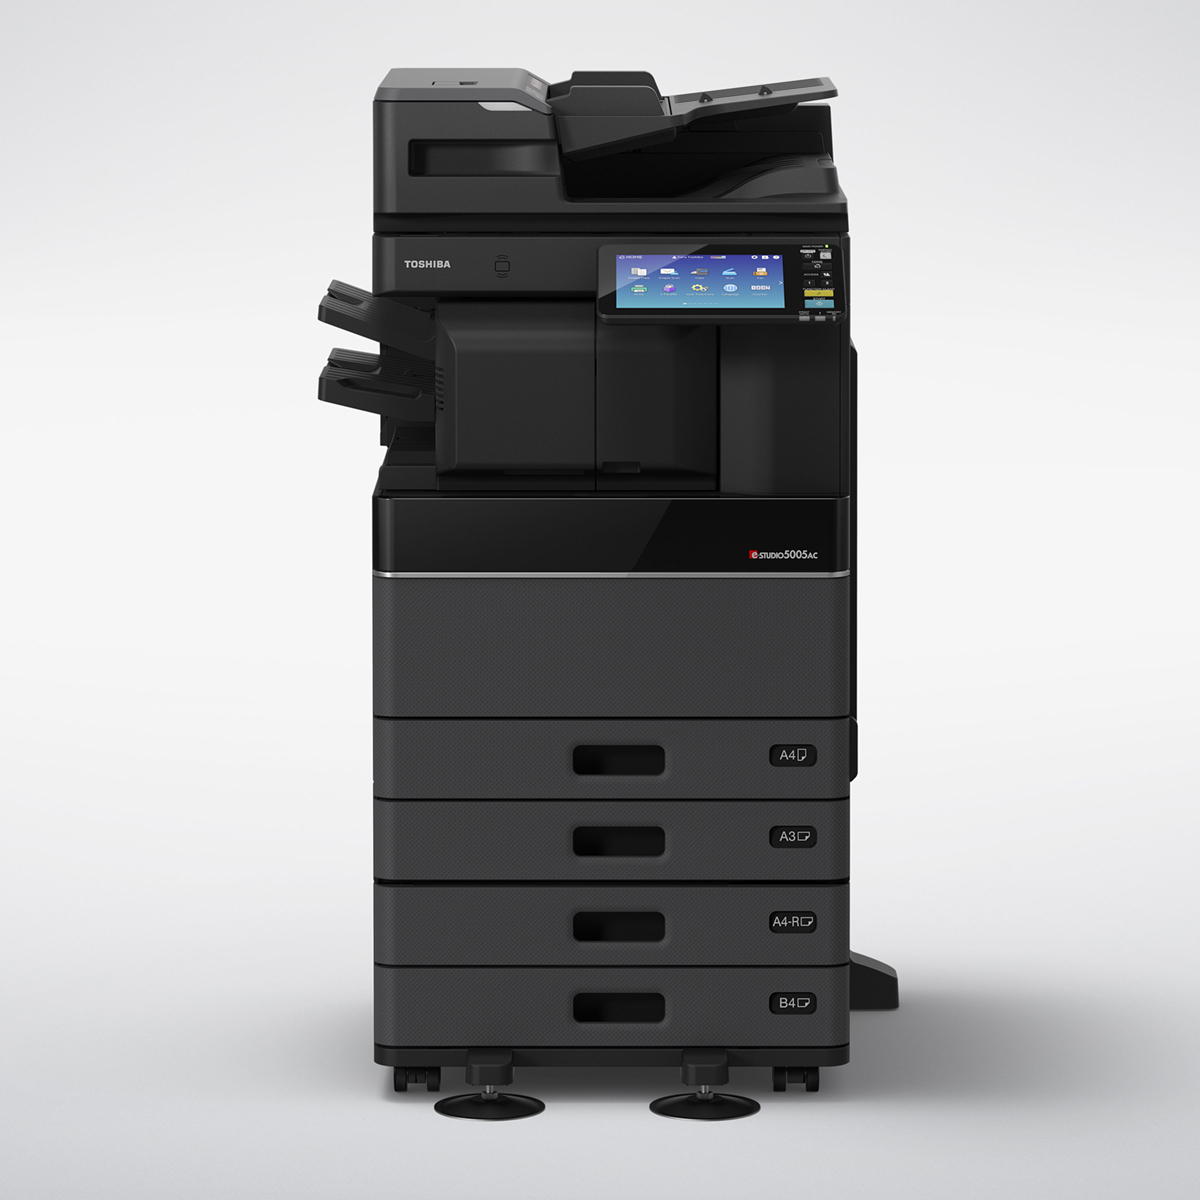 Toshiba 2505ac series